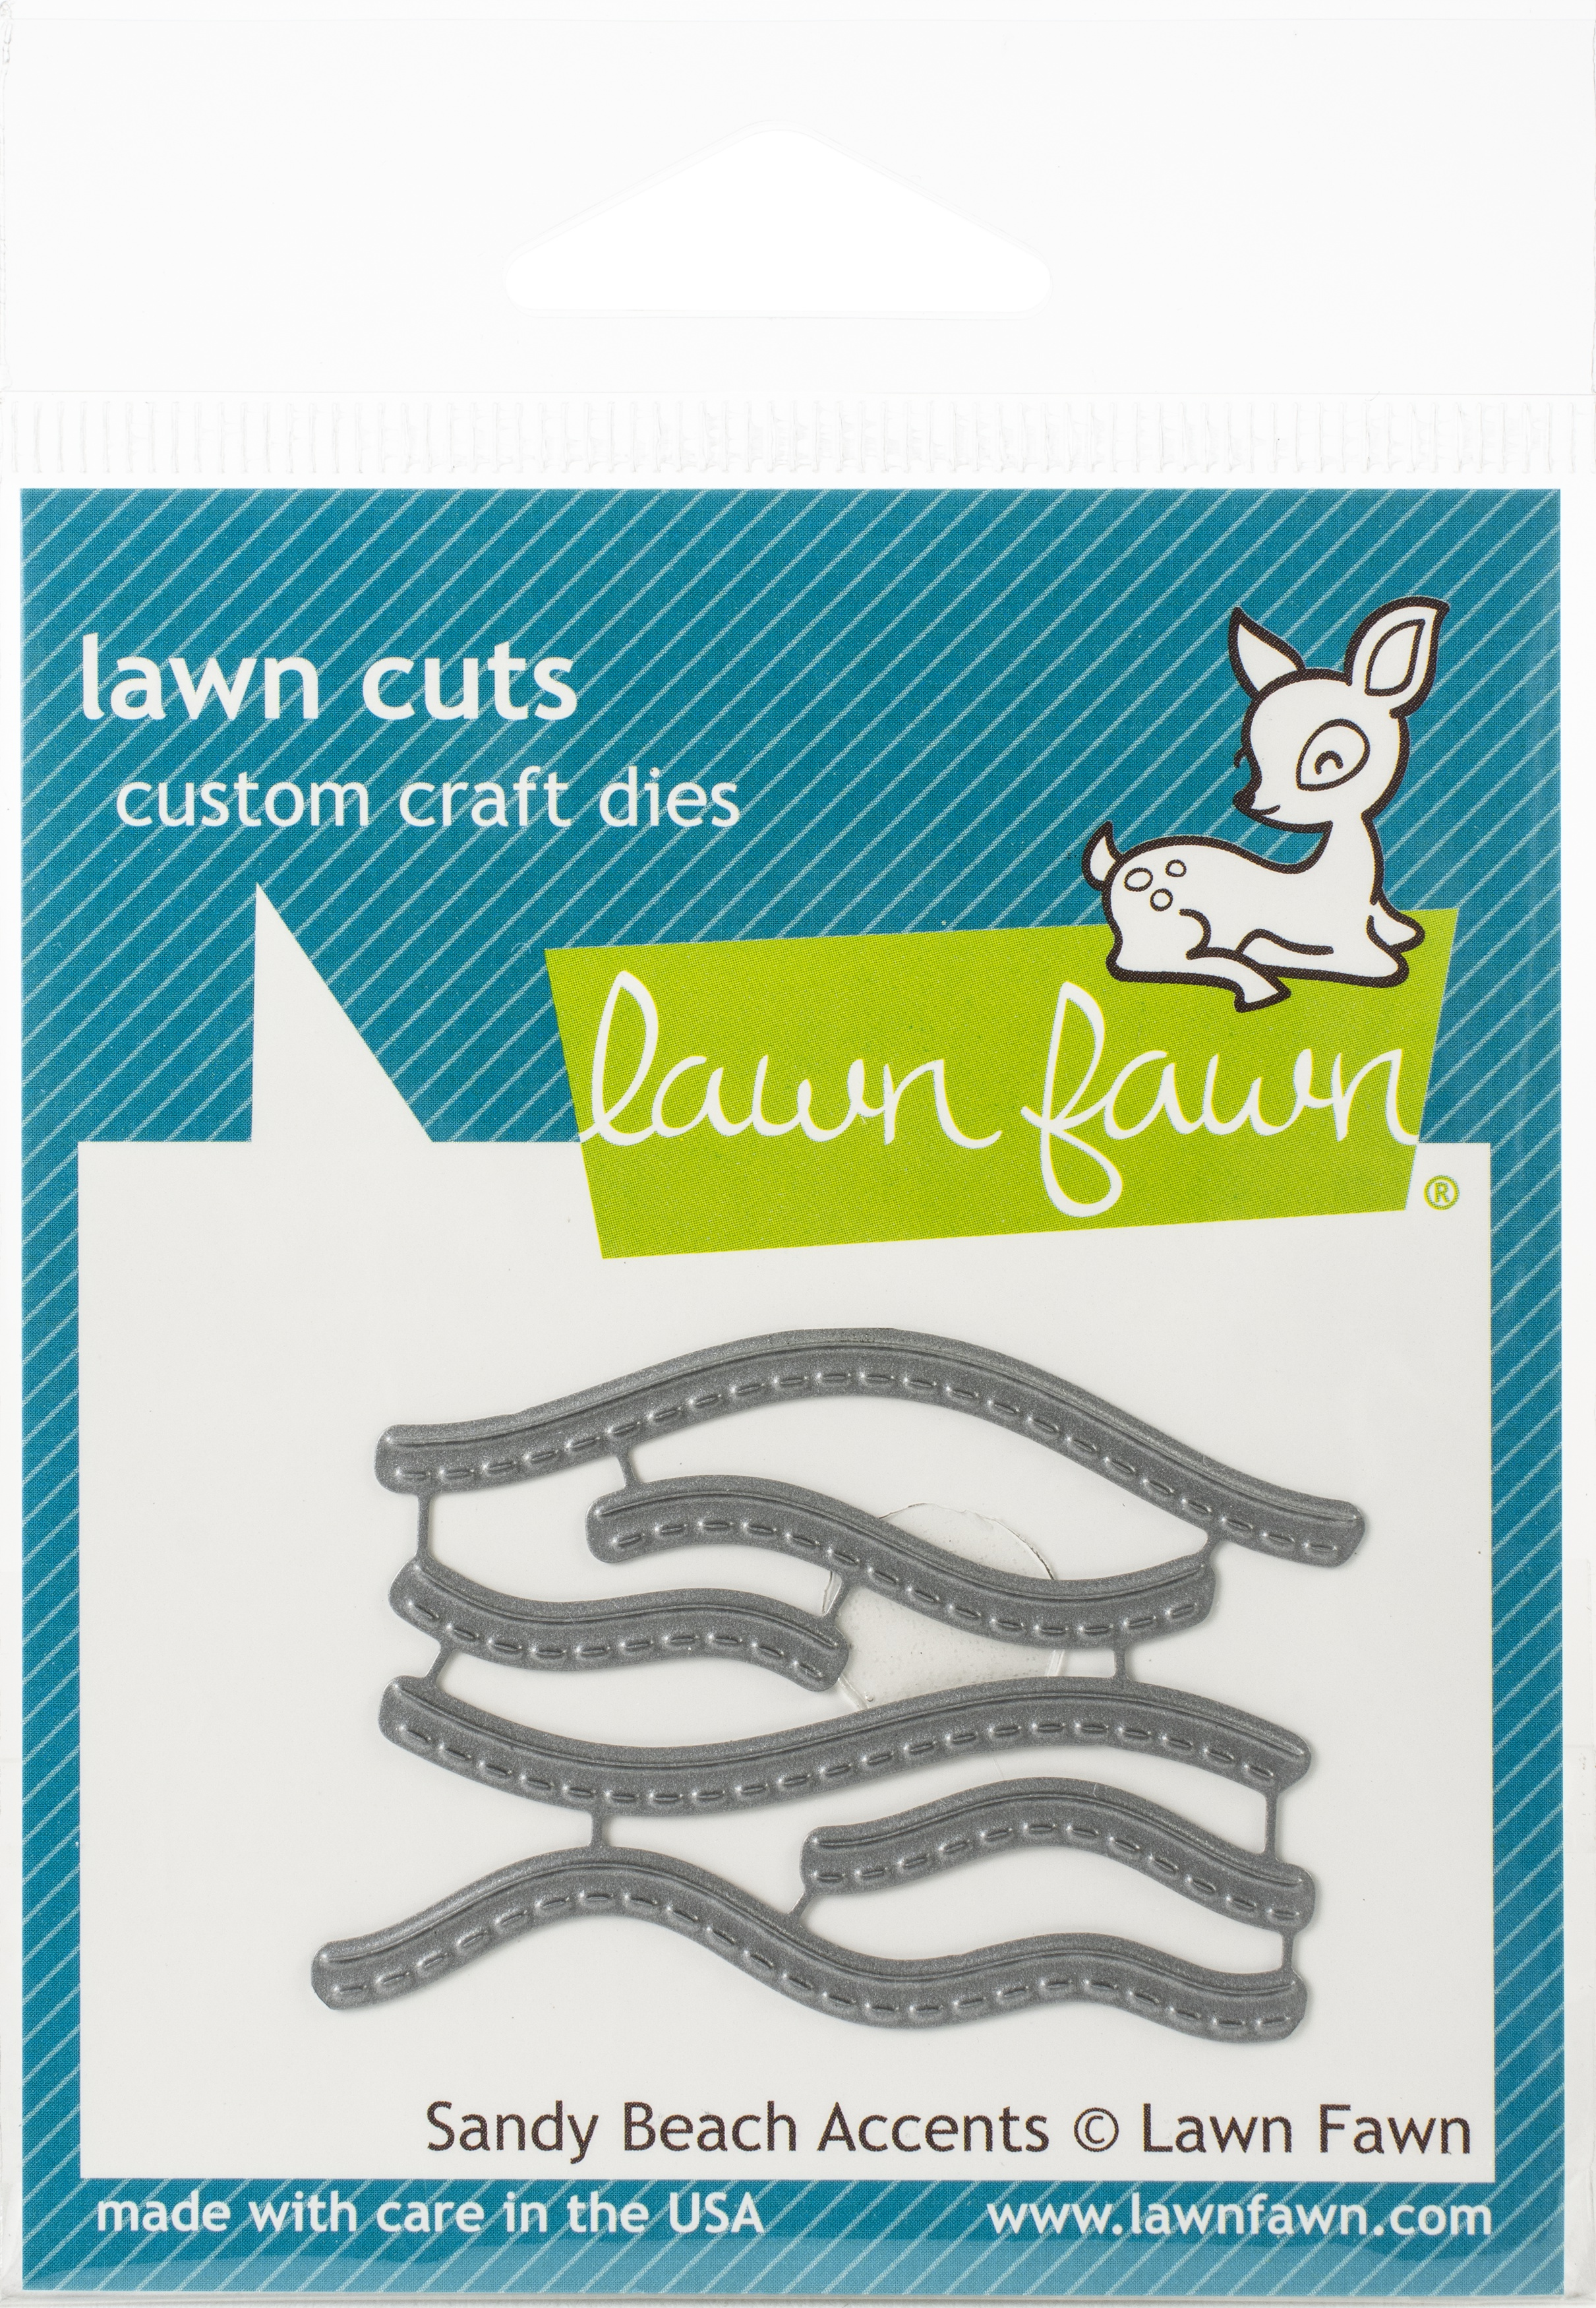 Lawn Cuts Custom Craft Die-Sandy Beach Accents